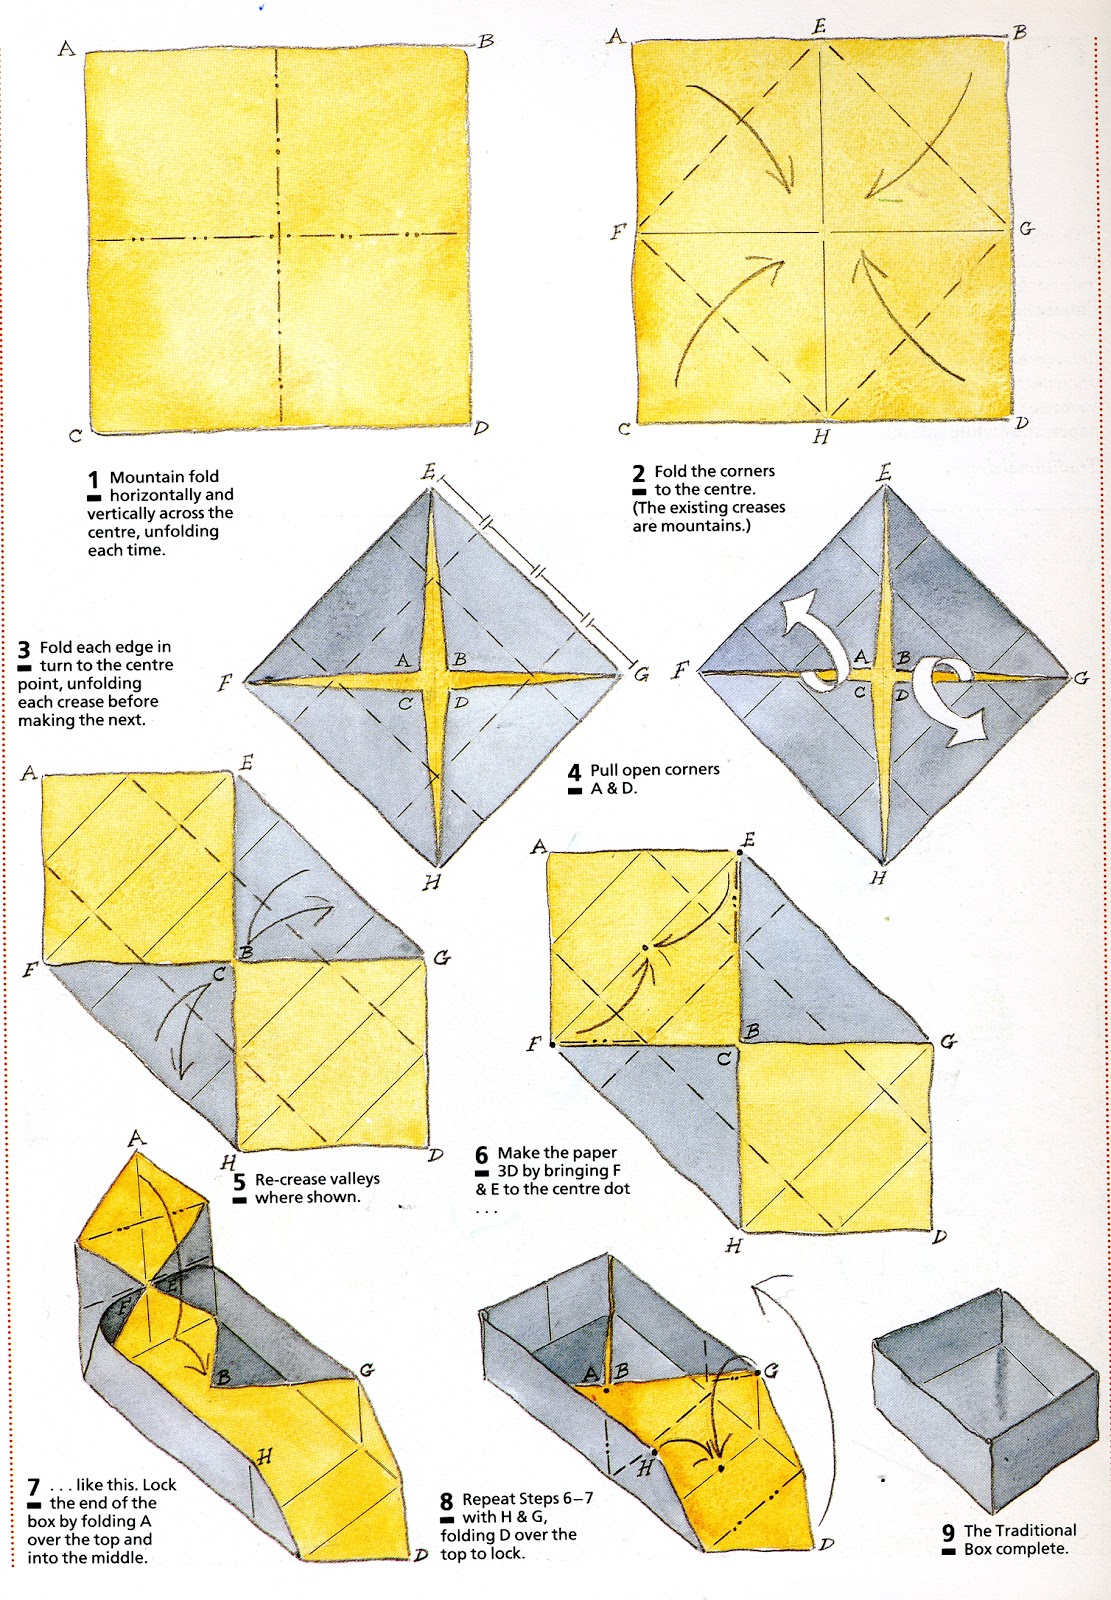 Folding Origami Box Diagram 2012 Harley Street Glide Wiring The Empty Oxo February 2013